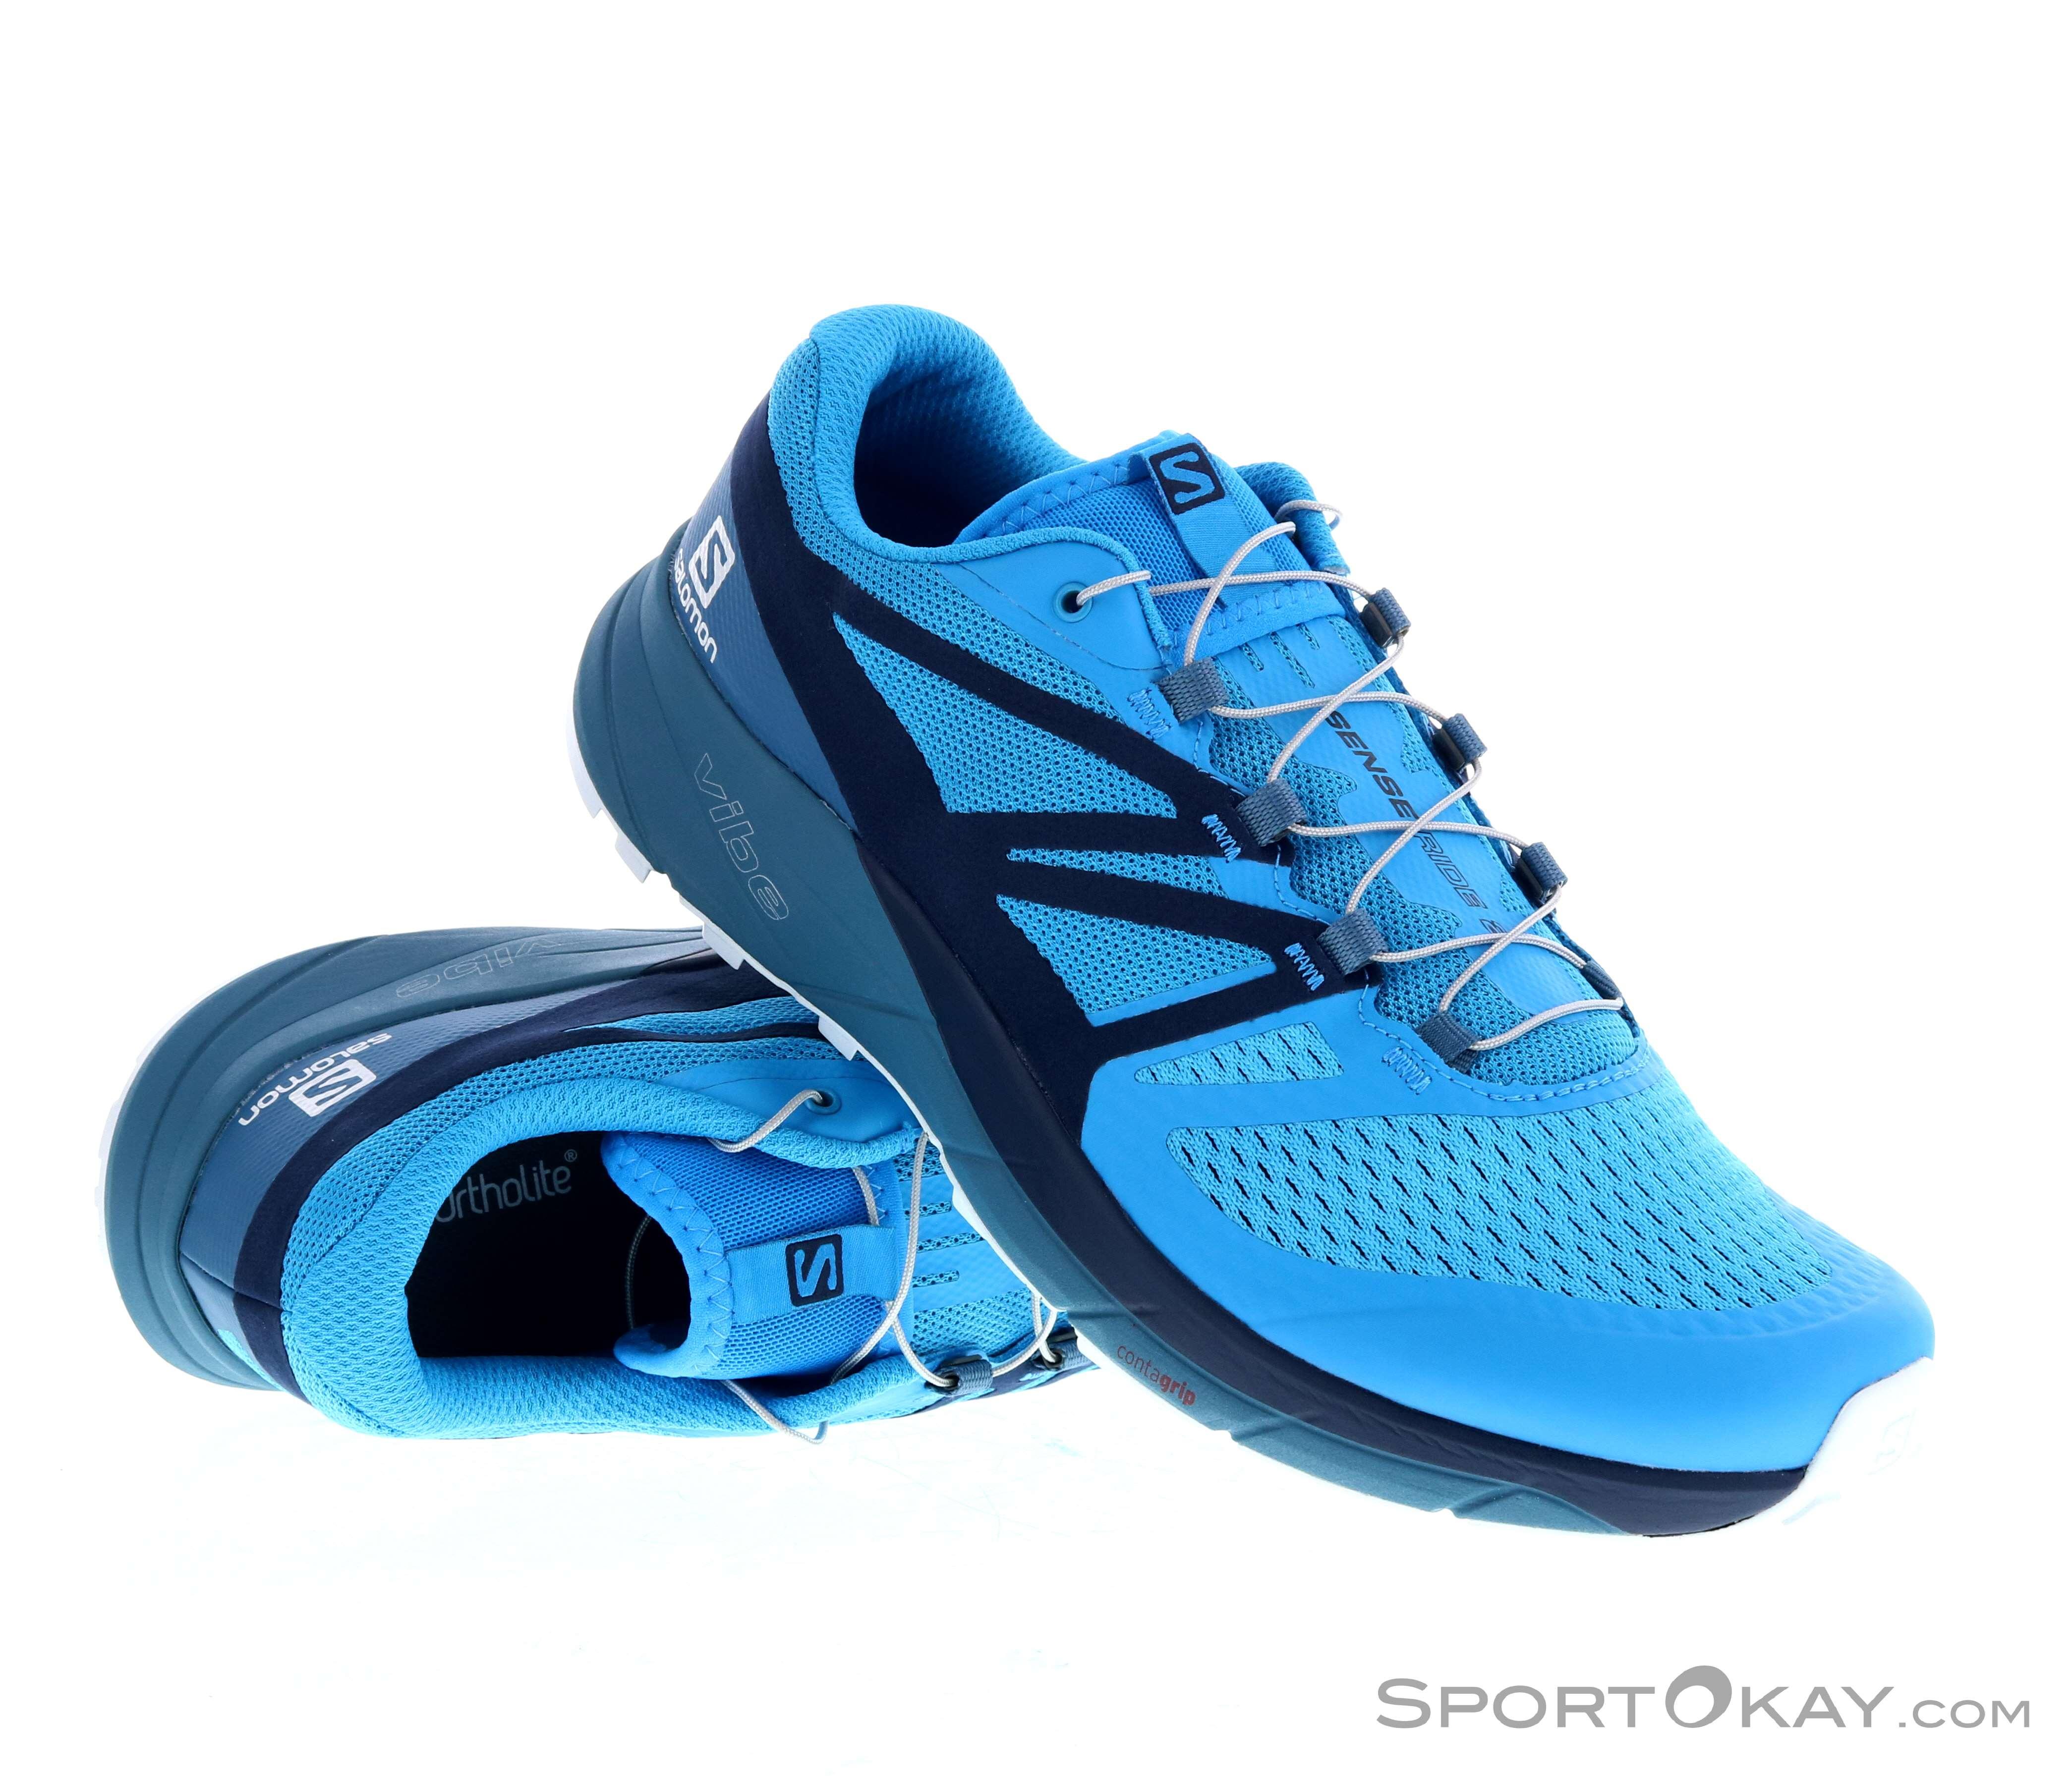 Salomon Salomon Sense Ride Mens Running Shoes